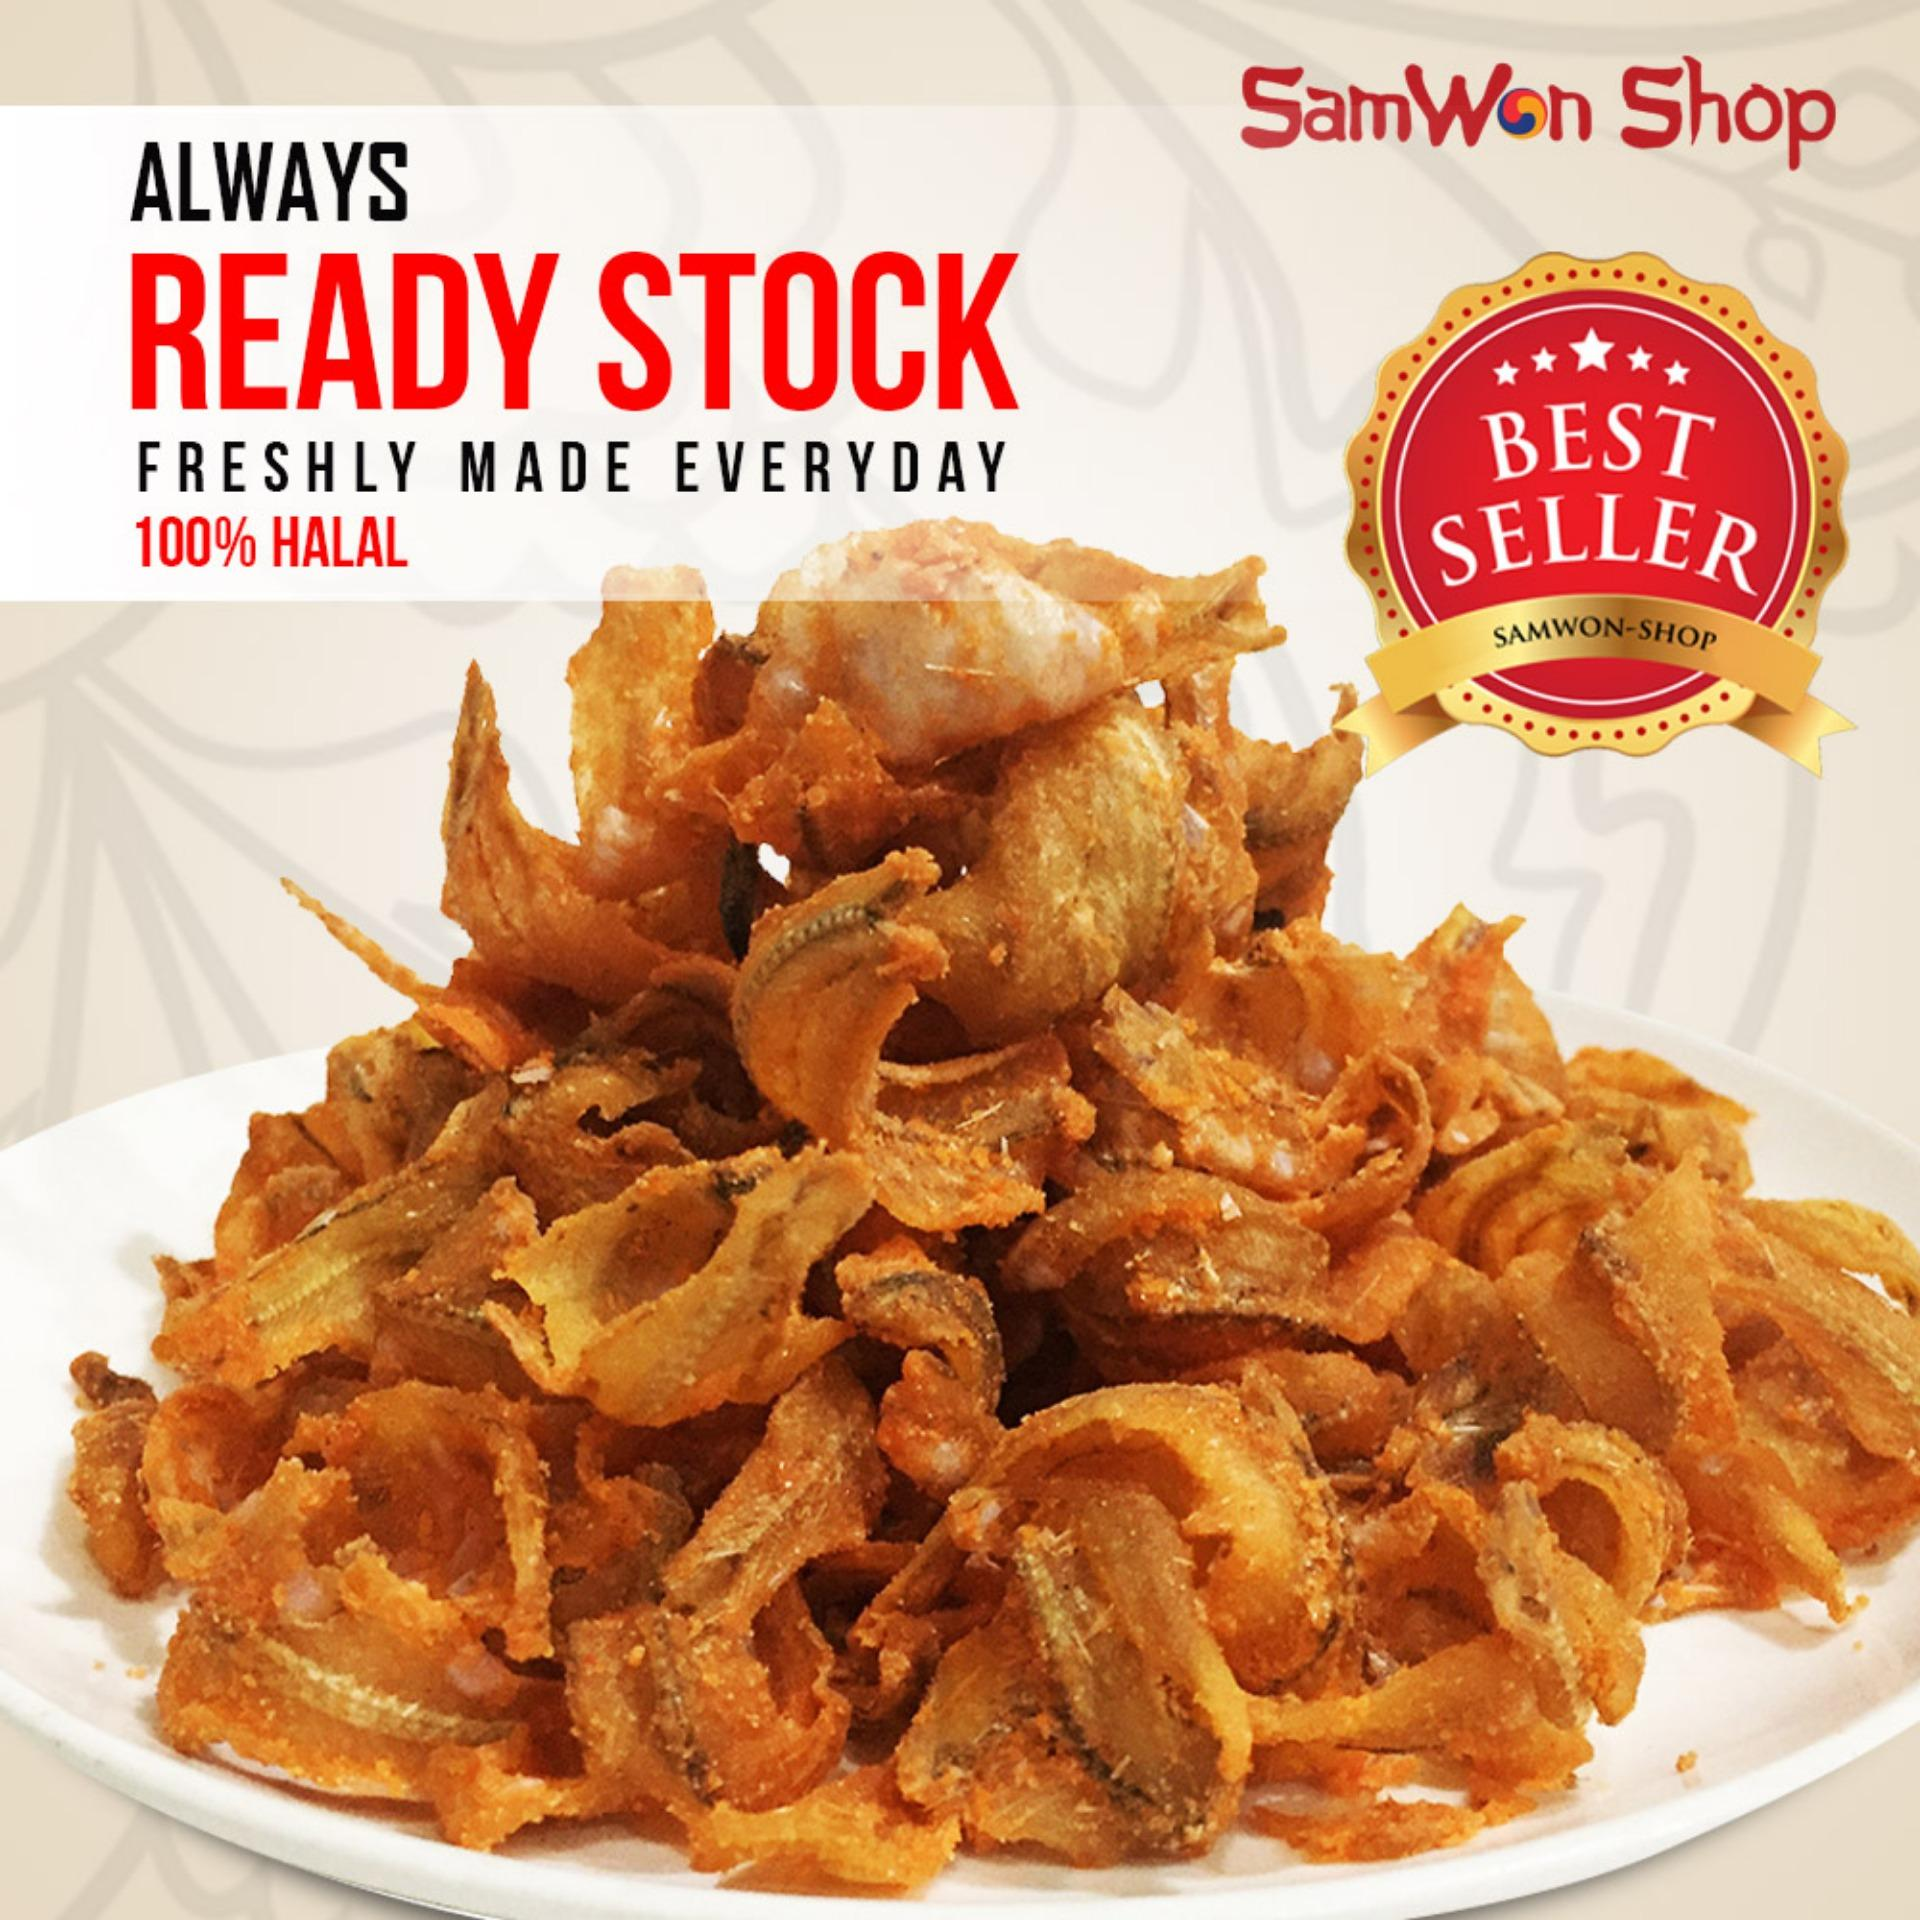 Samwon Tteokbokki Tokpoki 400 Gr Fresh Makanan Korea Enak Voucher Rp 100000 Restoran Lezat Bergizi Kimchi Teri Busan Bbq 130 Gram Crispy And Crunchy